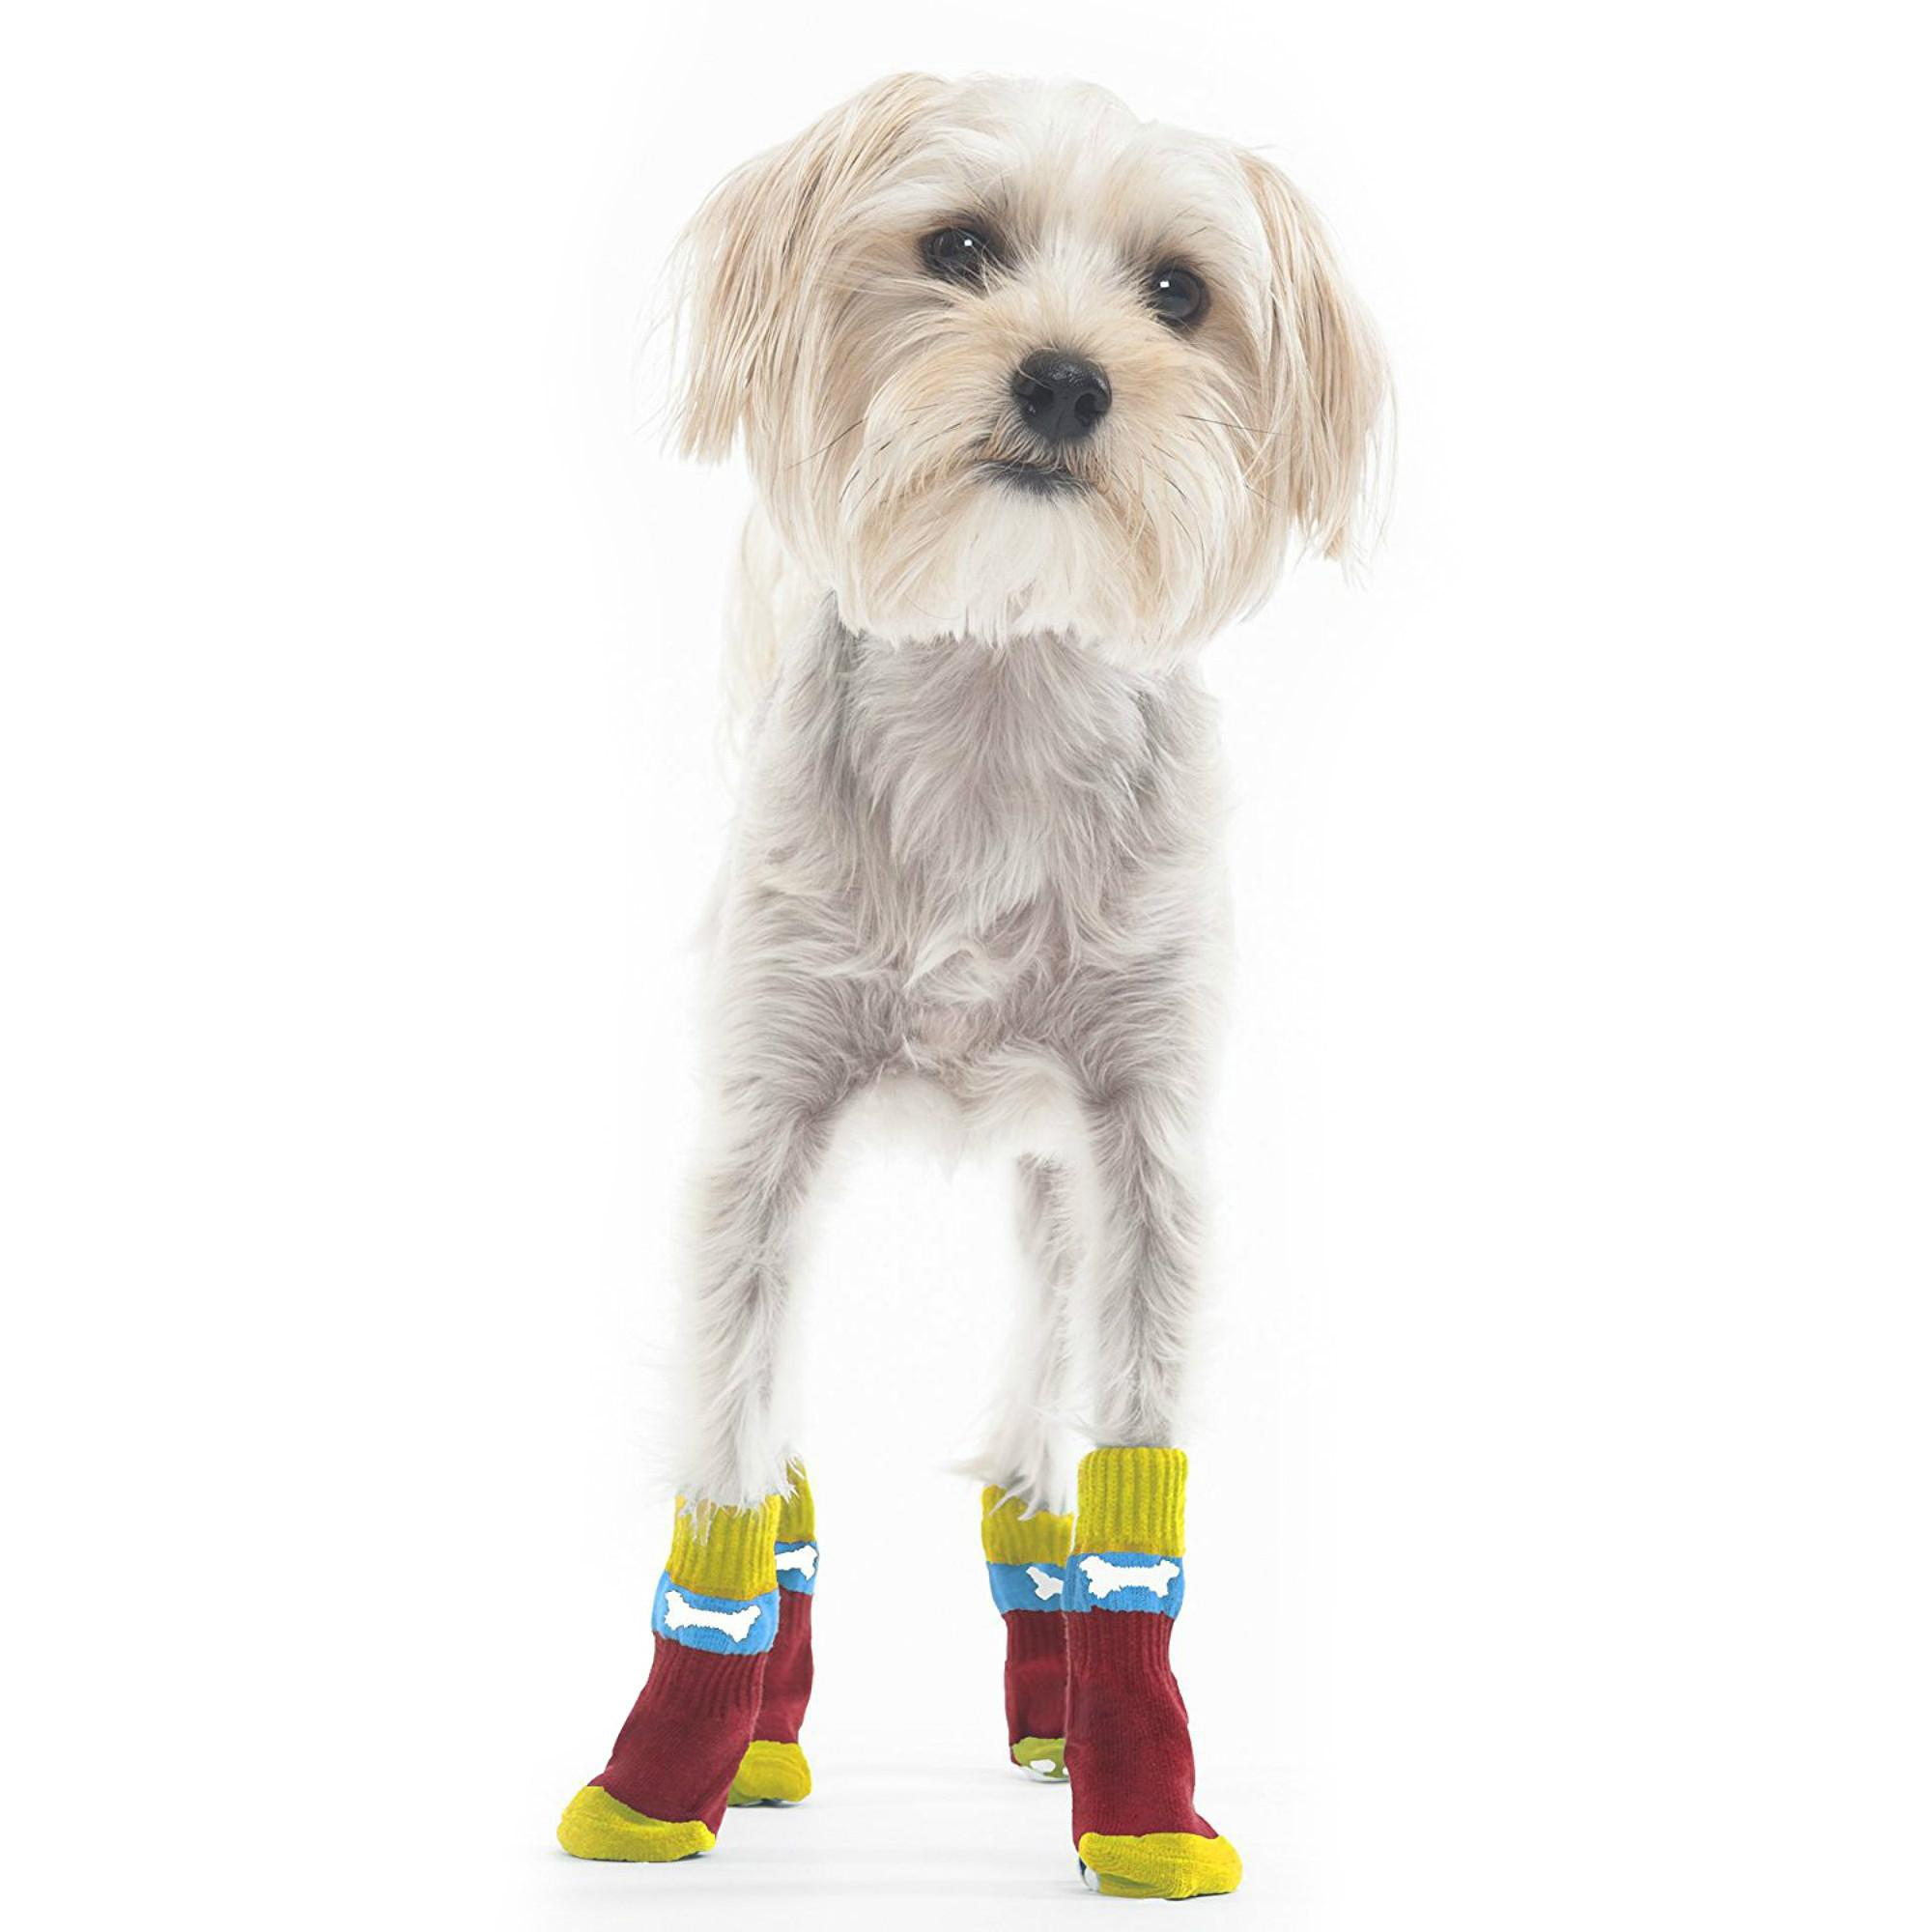 Bone Slipper Dog Socks - Red